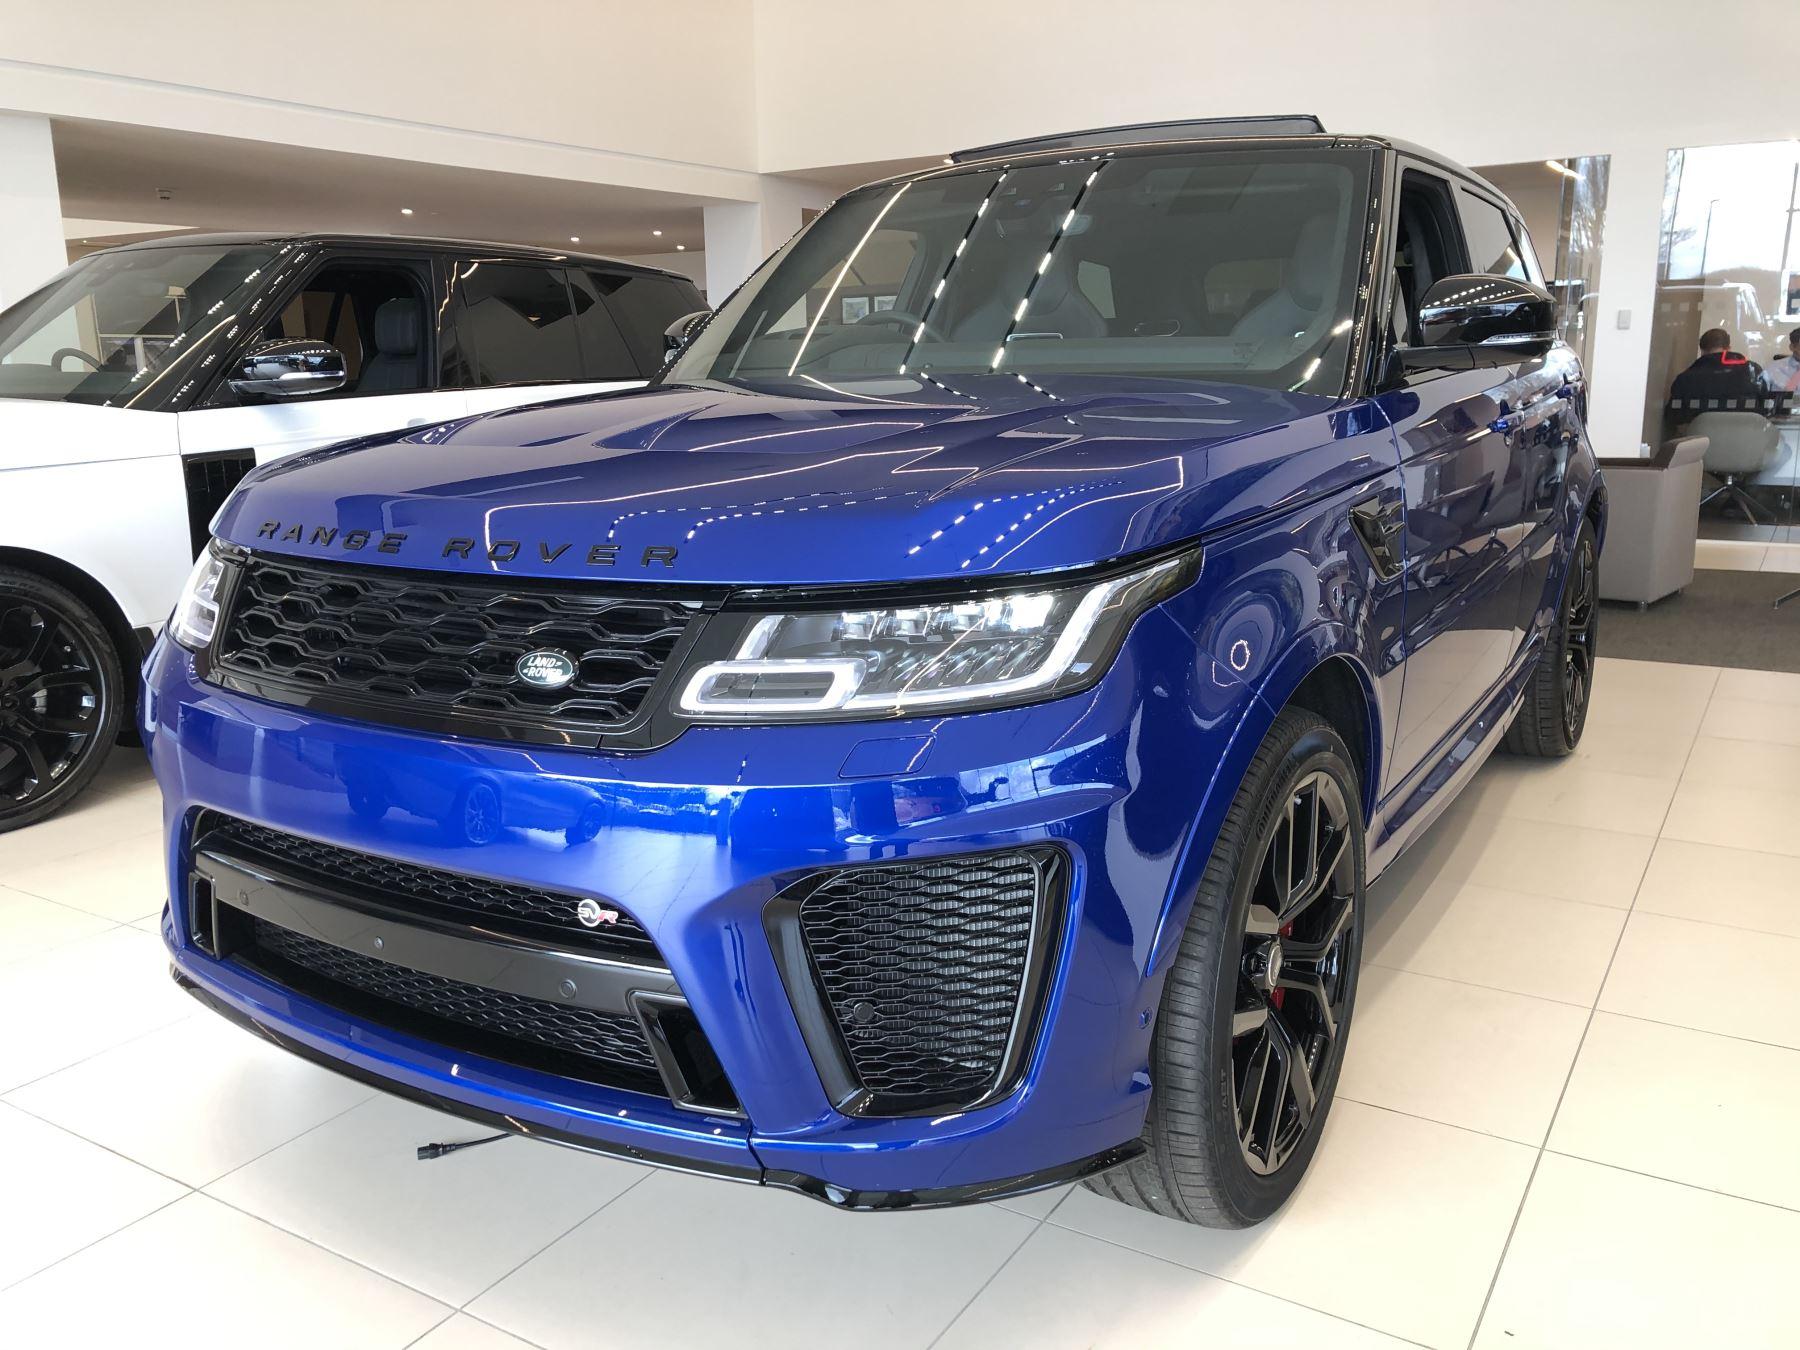 Land Rover Range Rover Sport 5.0 P575 S/C SVR Automatic 5 door Estate (19MY)